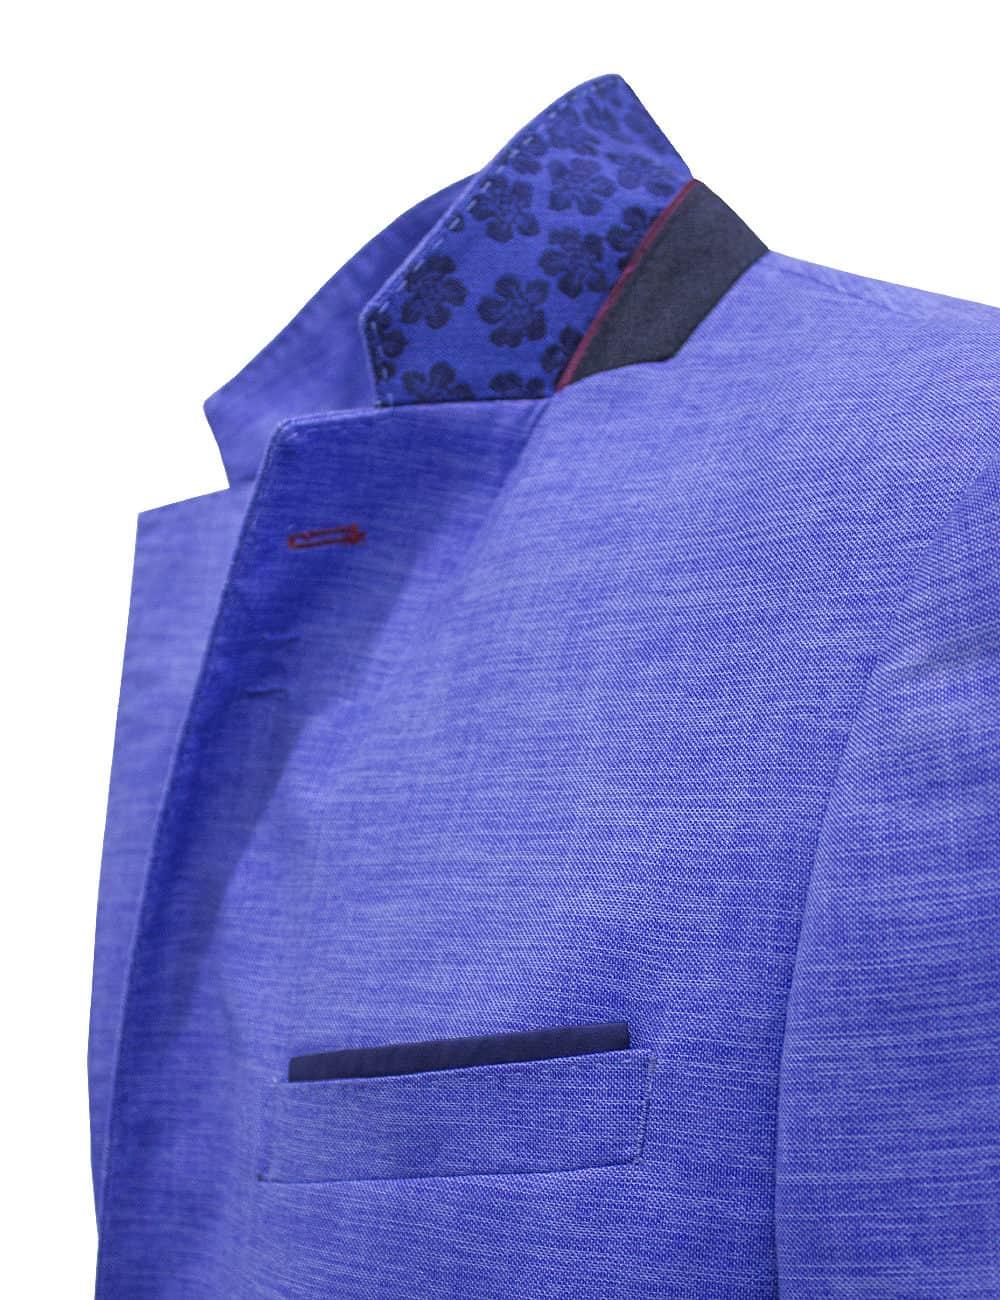 Slim Fit Light Blue Blazer - S2B8.4